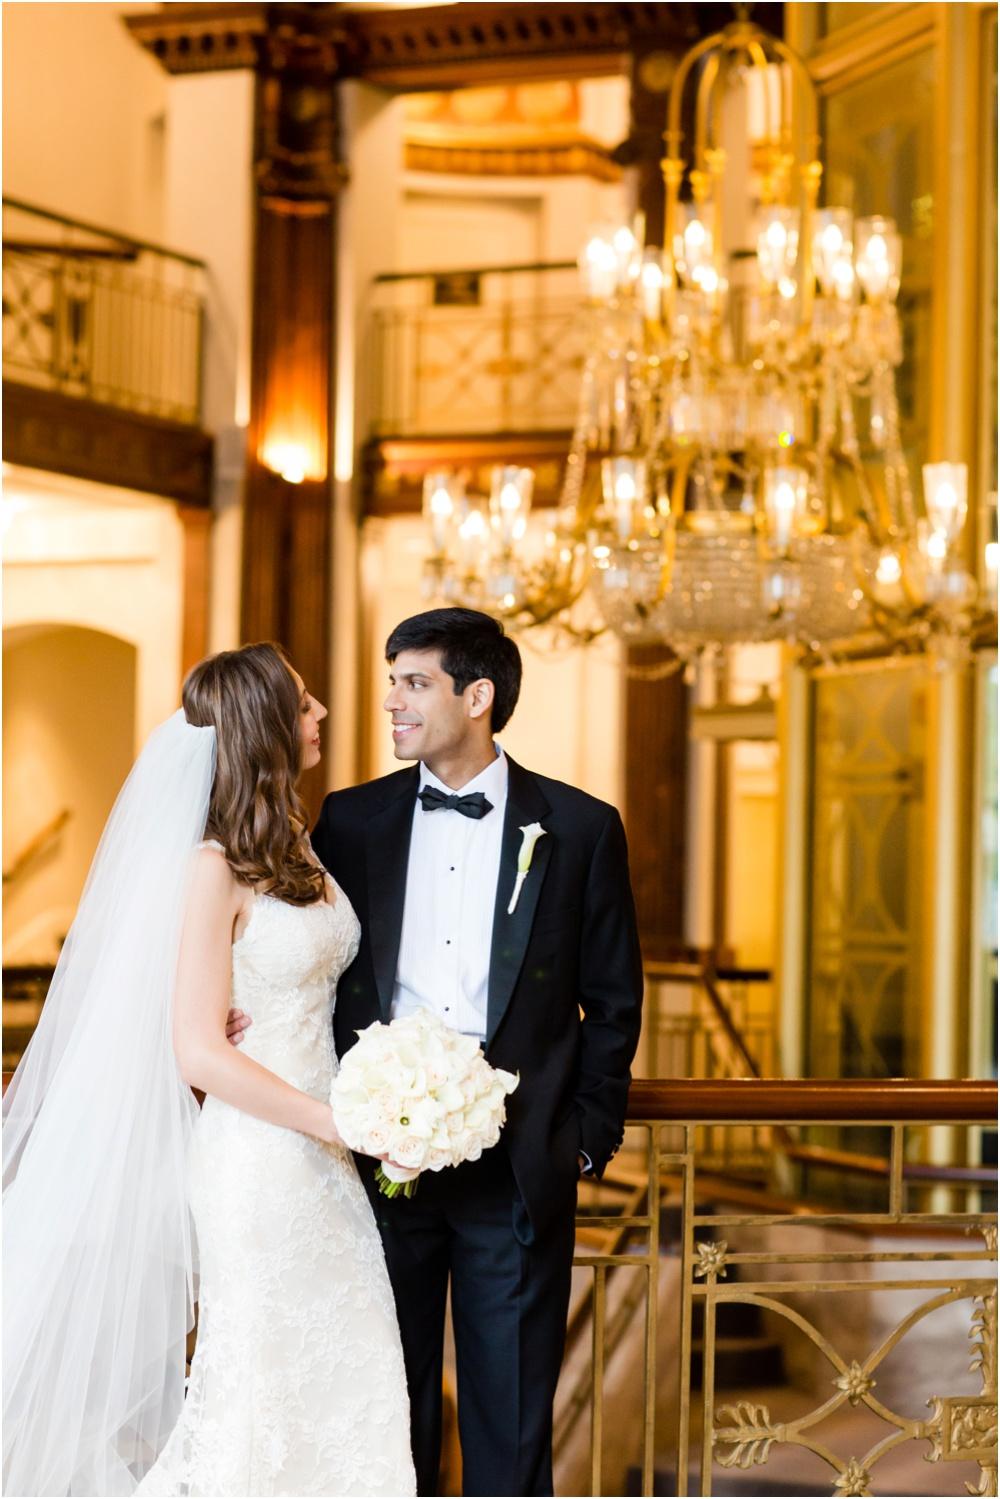 RI-Wedding-Photographer-Lefebvre-Photo-Blog_2935.jpg